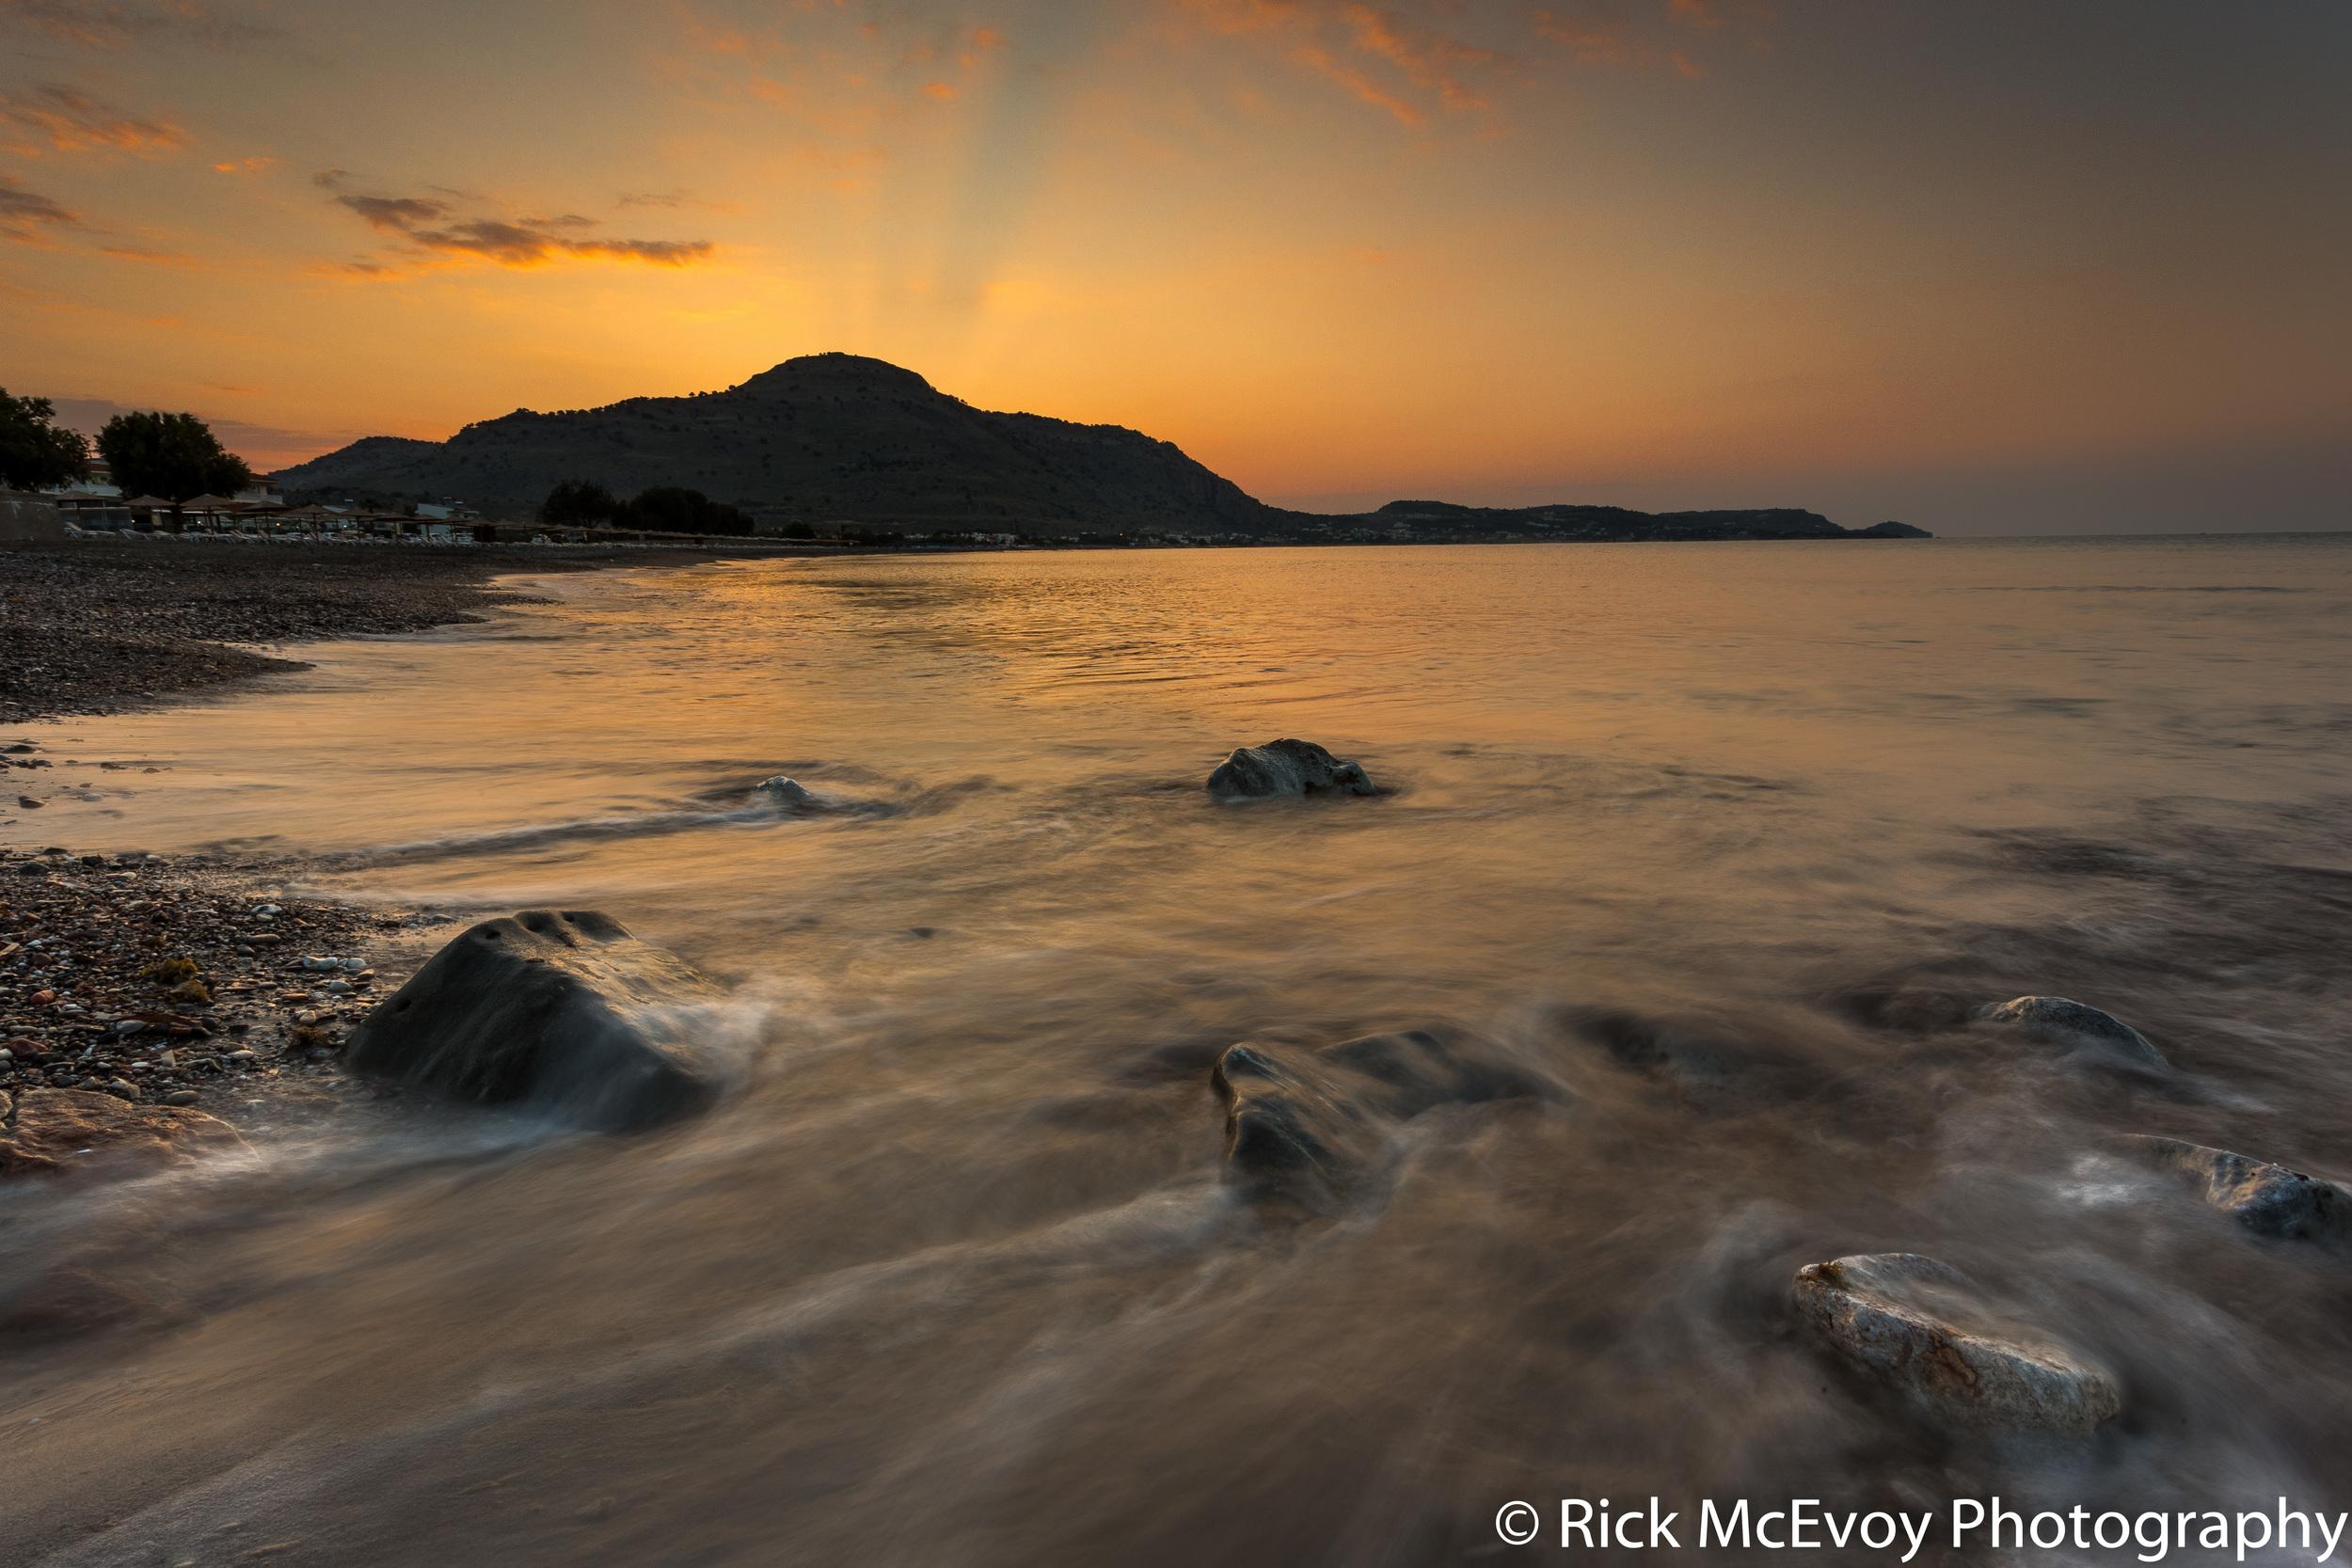 Sunrise, Lardos, Rhodes, Greece, by professional photographer Rick McEvoy